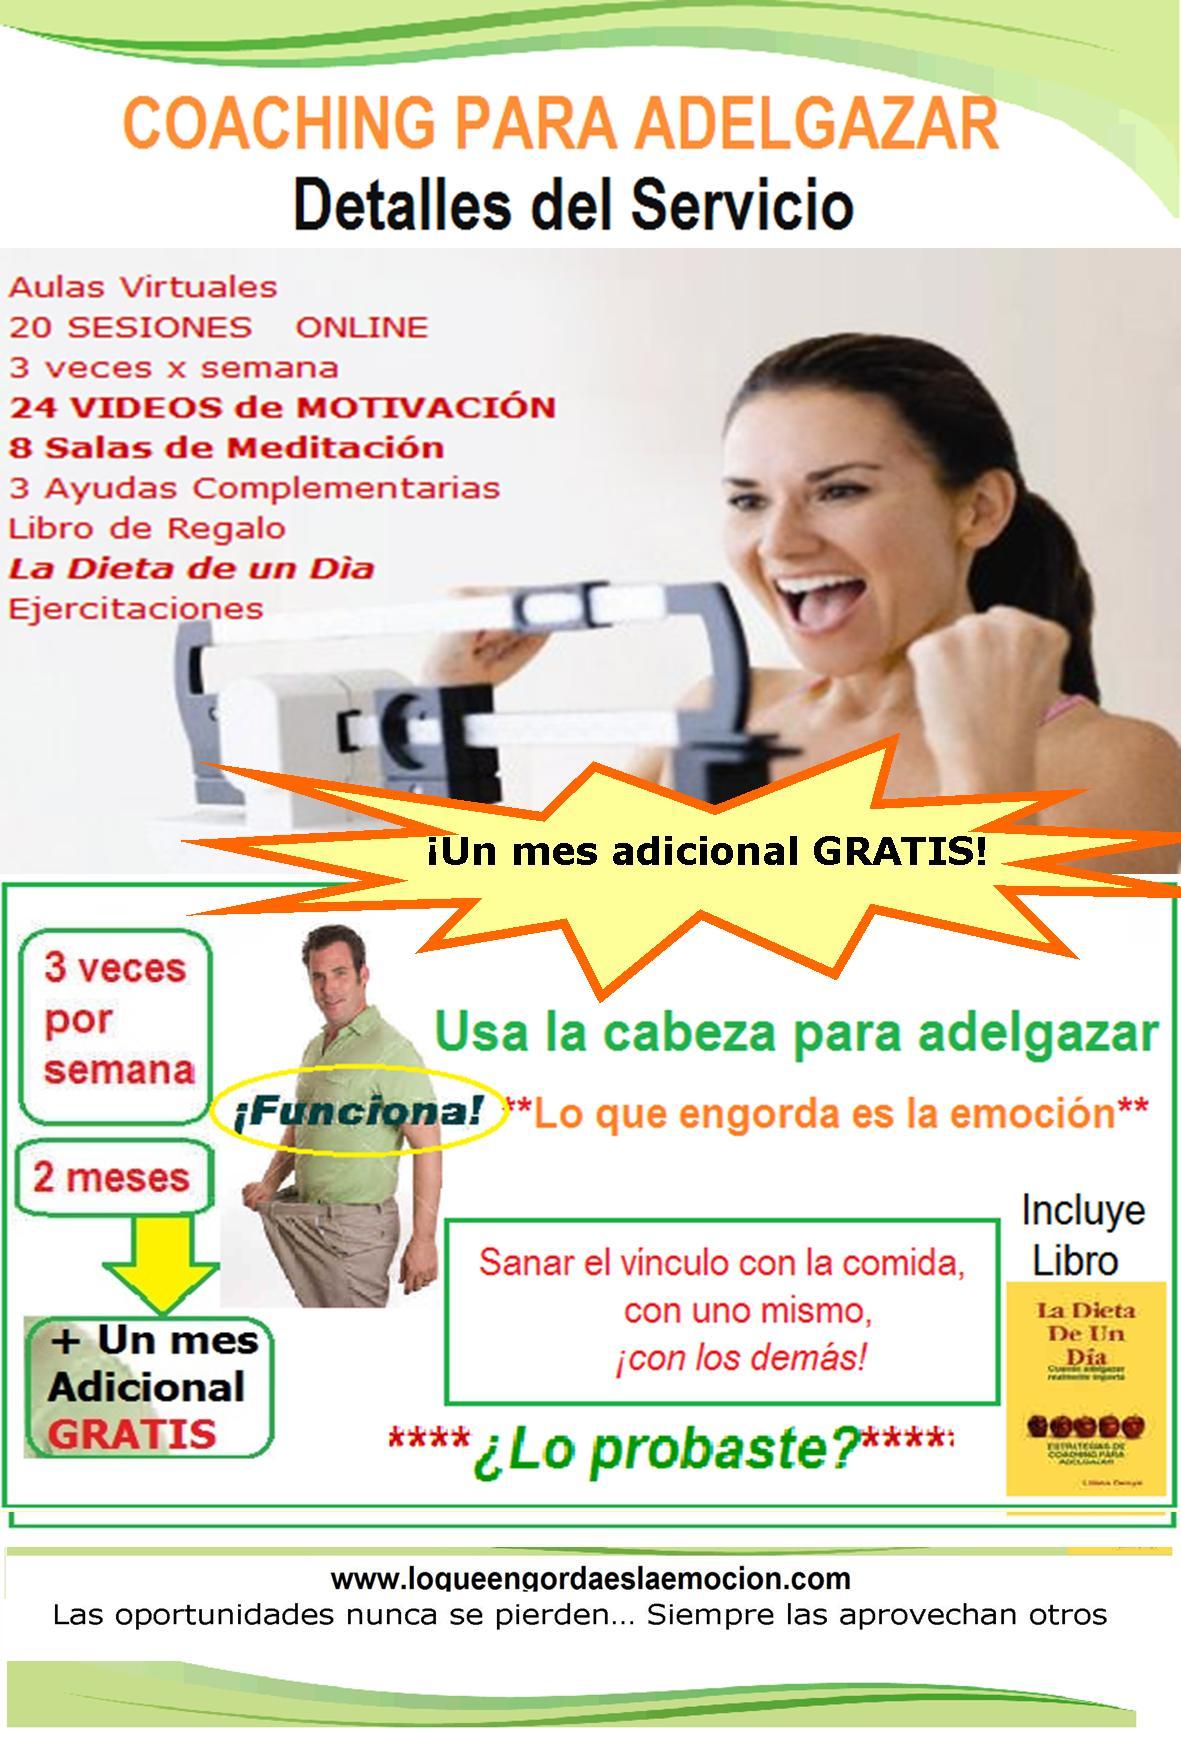 http://www.loqueengordaeslaemocion.com/images/10x15-INT-DORSO-4.jpg